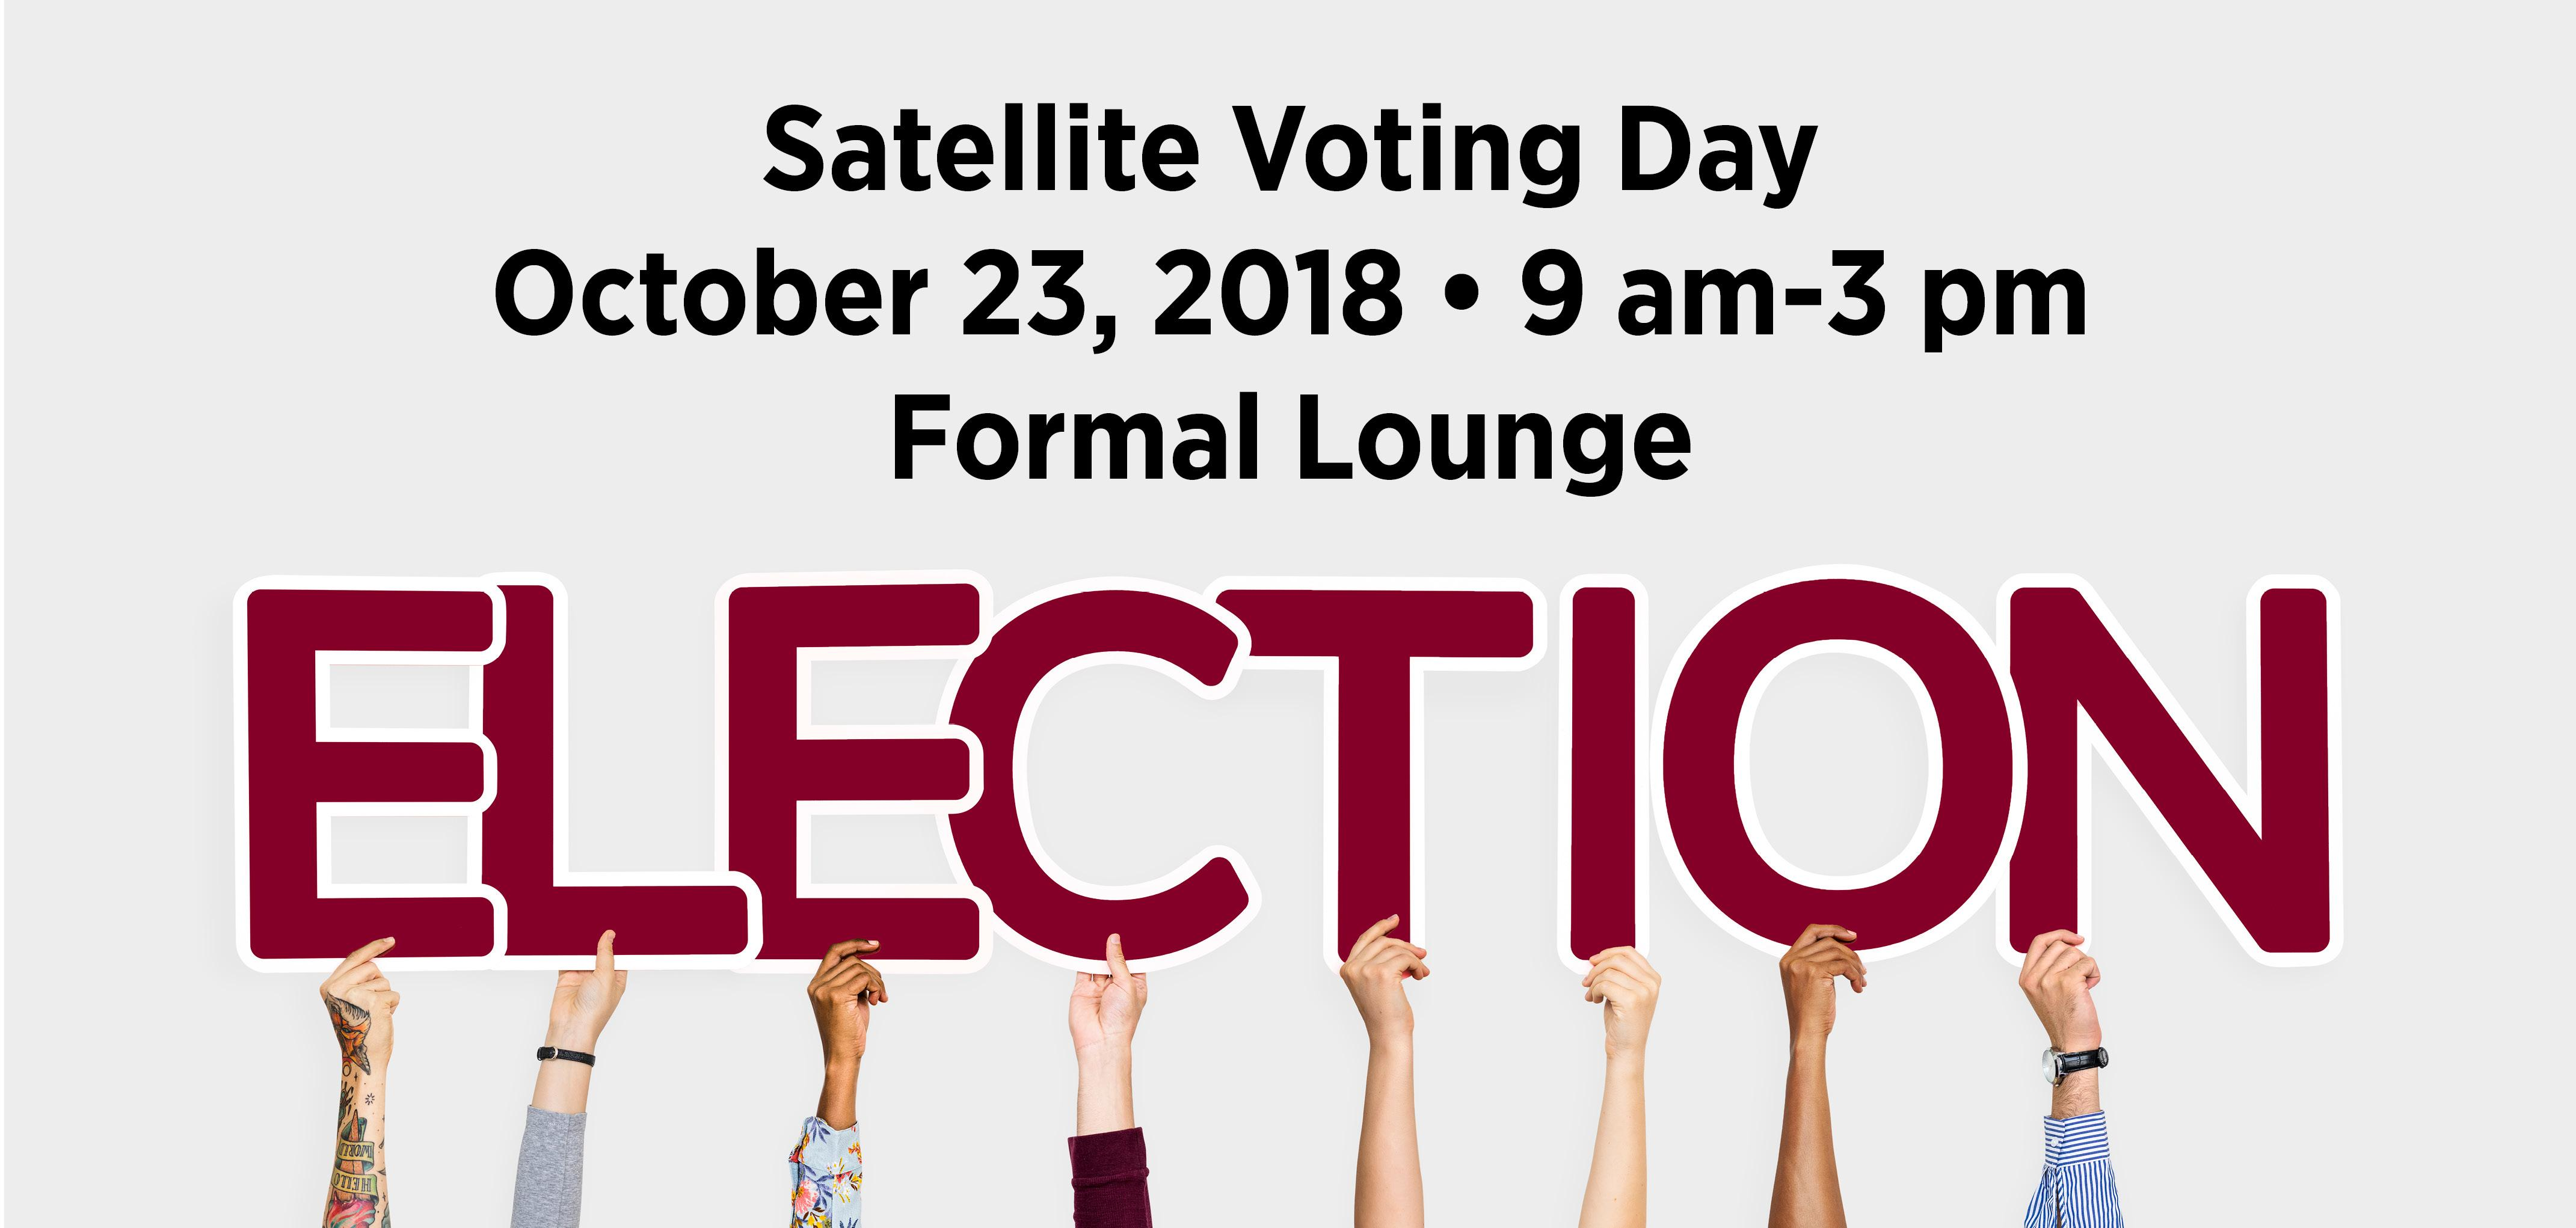 Satellite Voting Day